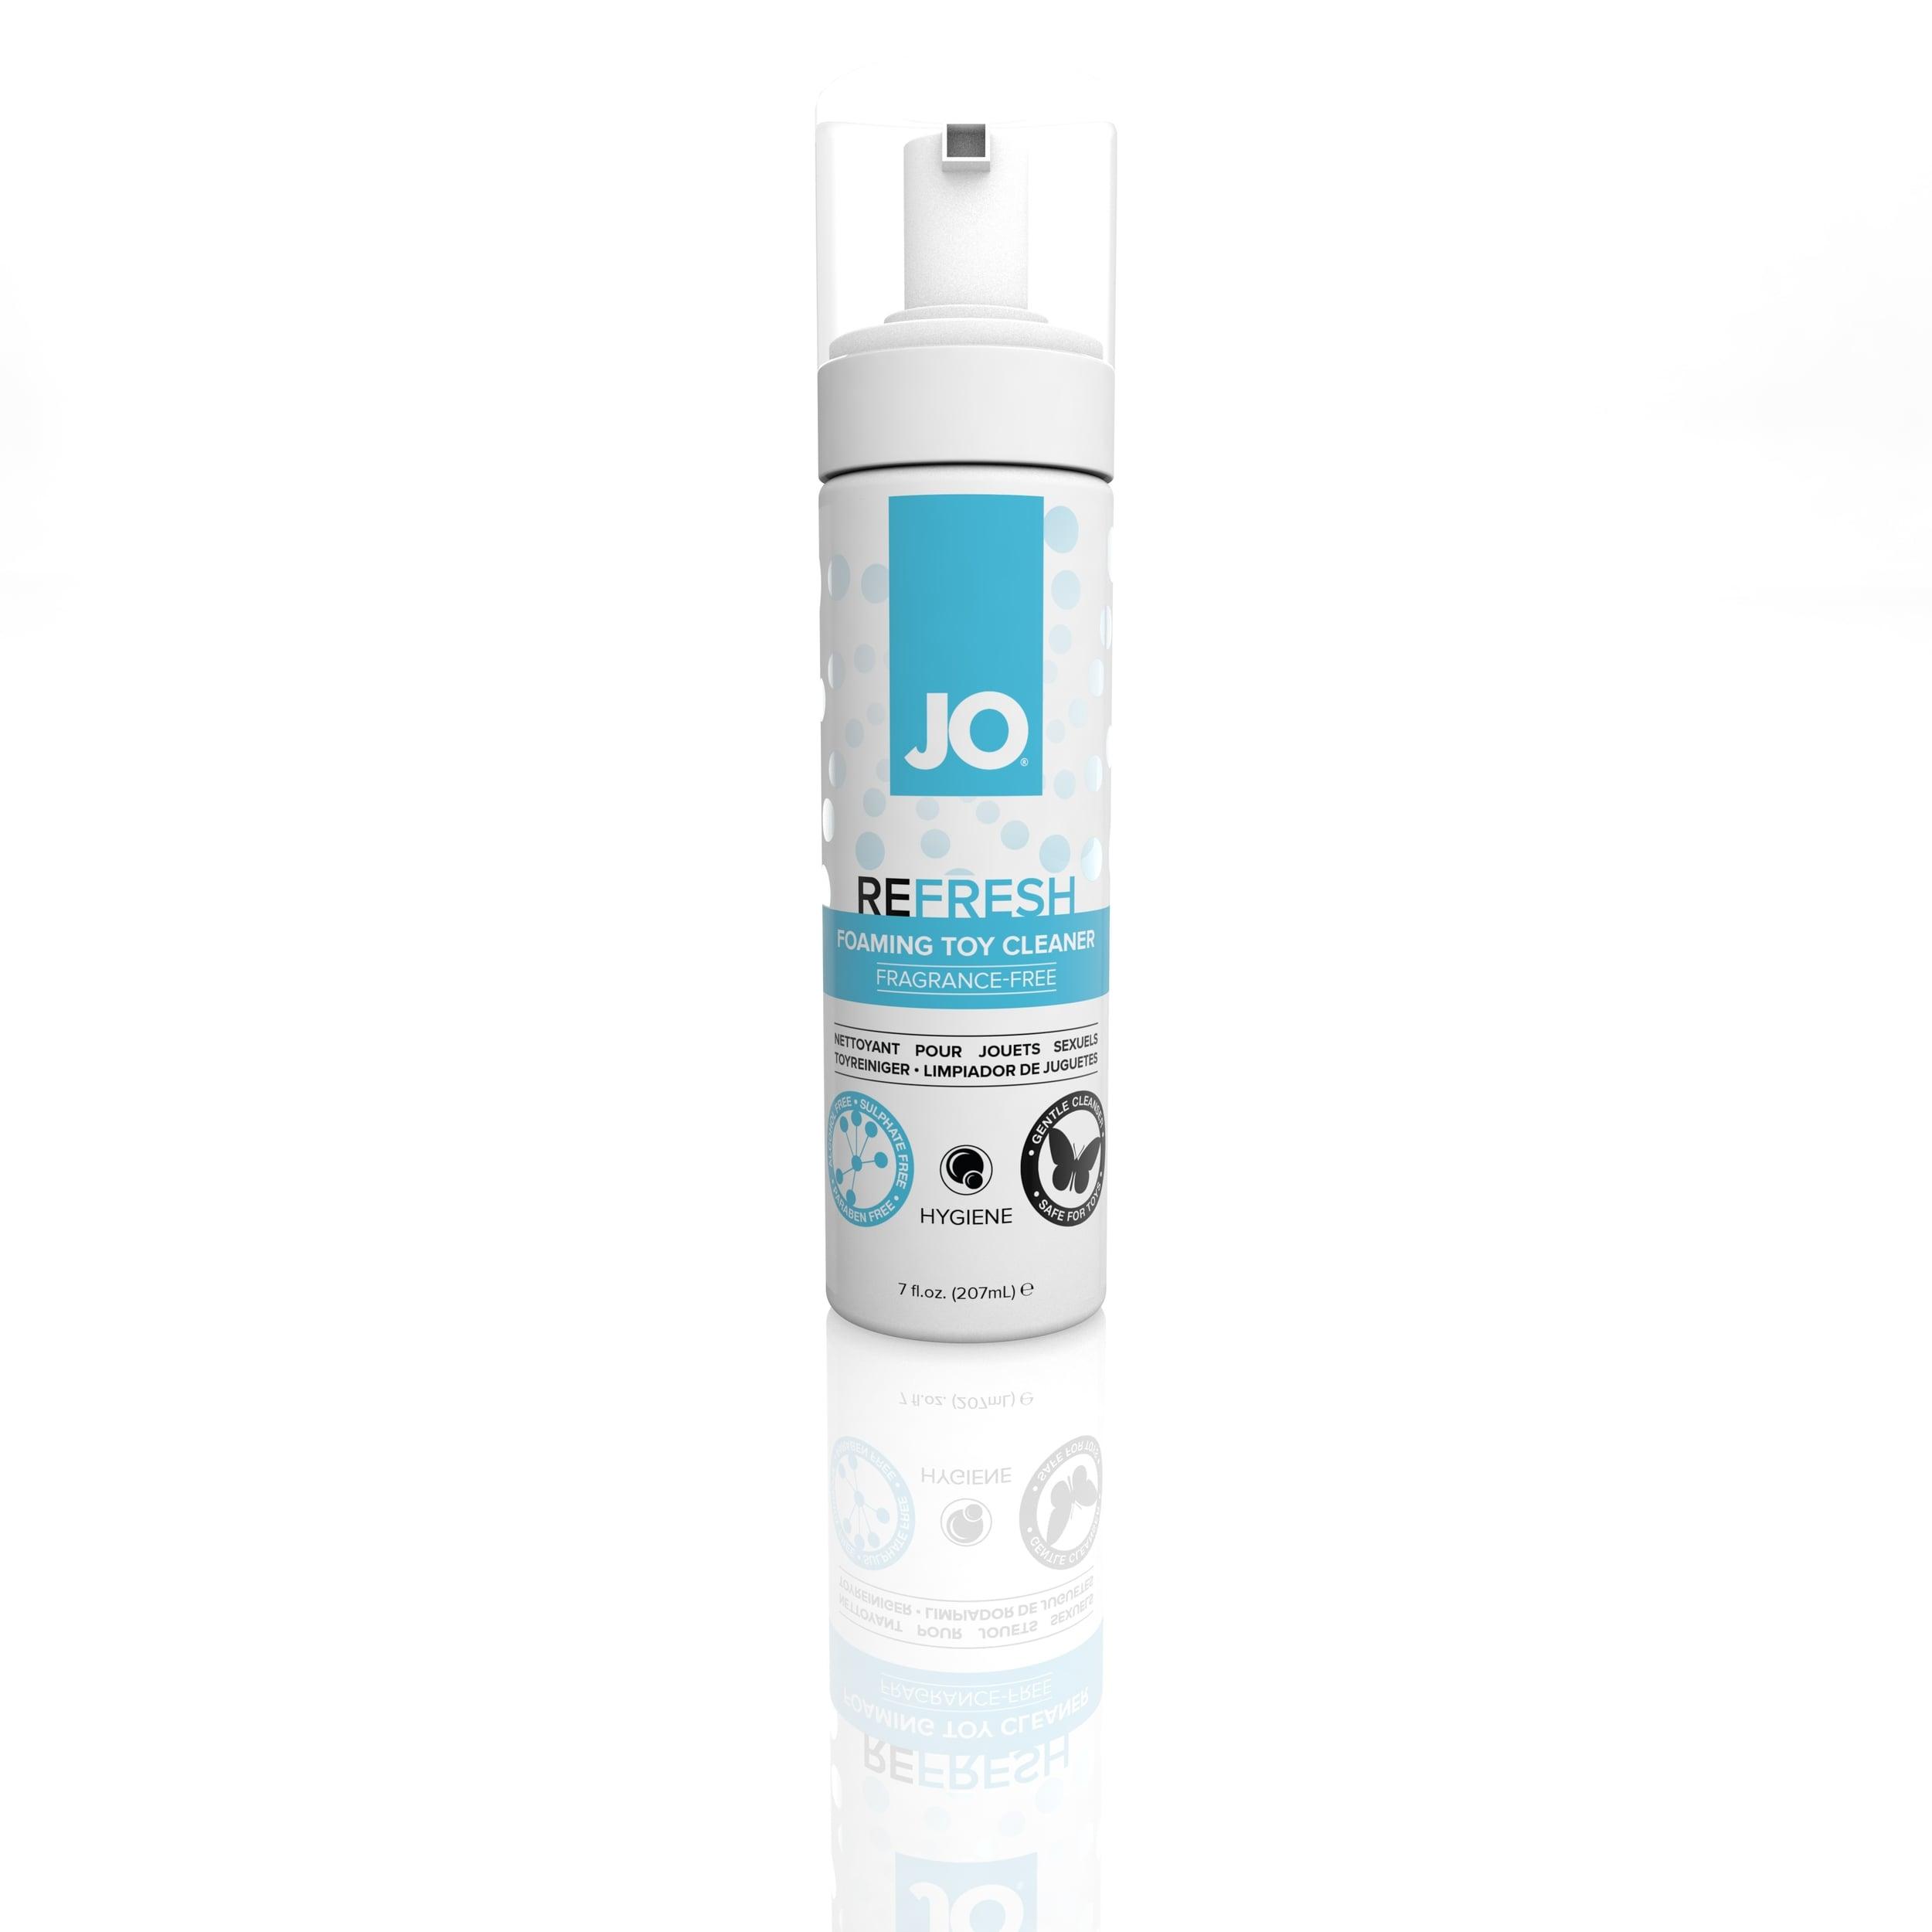 40200 - JO REFRESH - FOAMING TOY CLEANER - 7fl.oz207mL.jpg